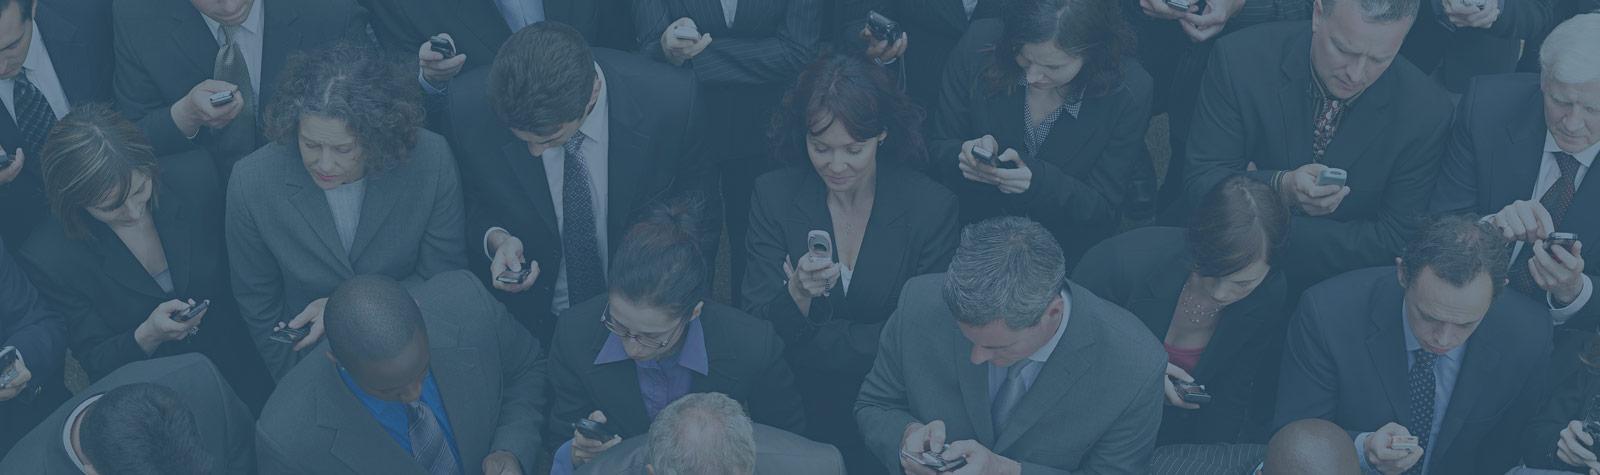 Sevrage de Smartphone